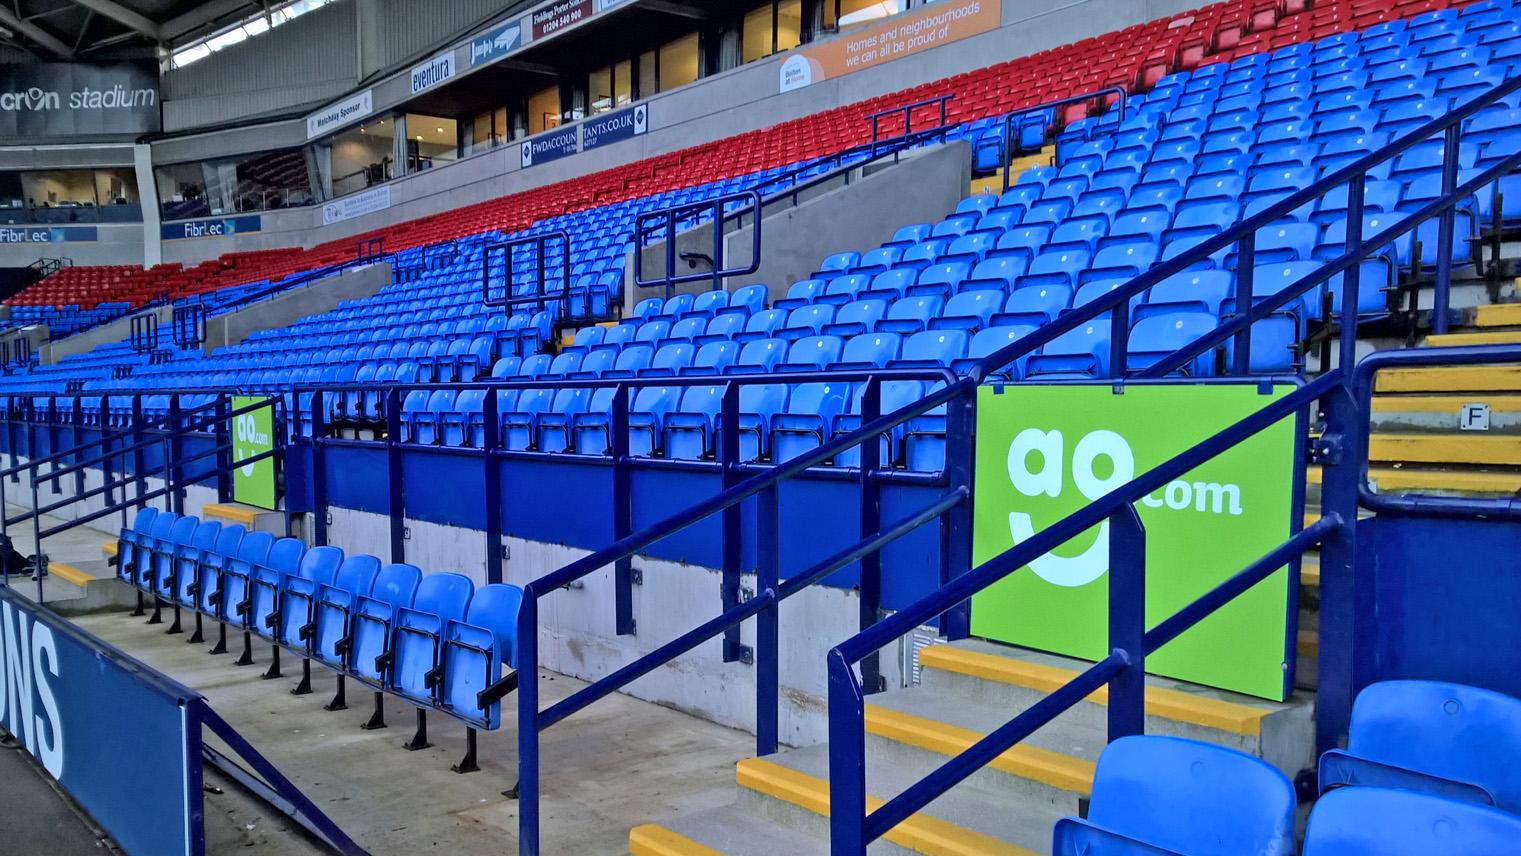 Seamless Vinyl Photography Backdrop Football Stadium Match: Urgent Vinyl Graphics For Bolton Wanderers Football